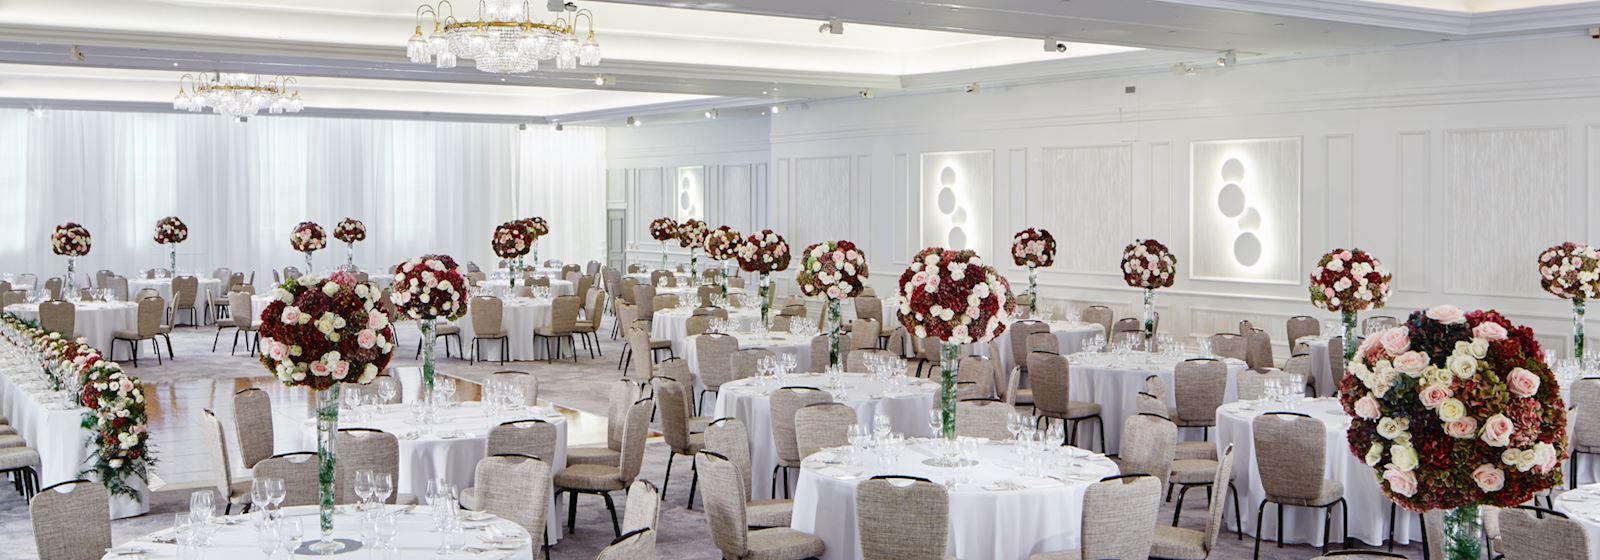 London Marriott Hotel Grosvenor Square Weddings